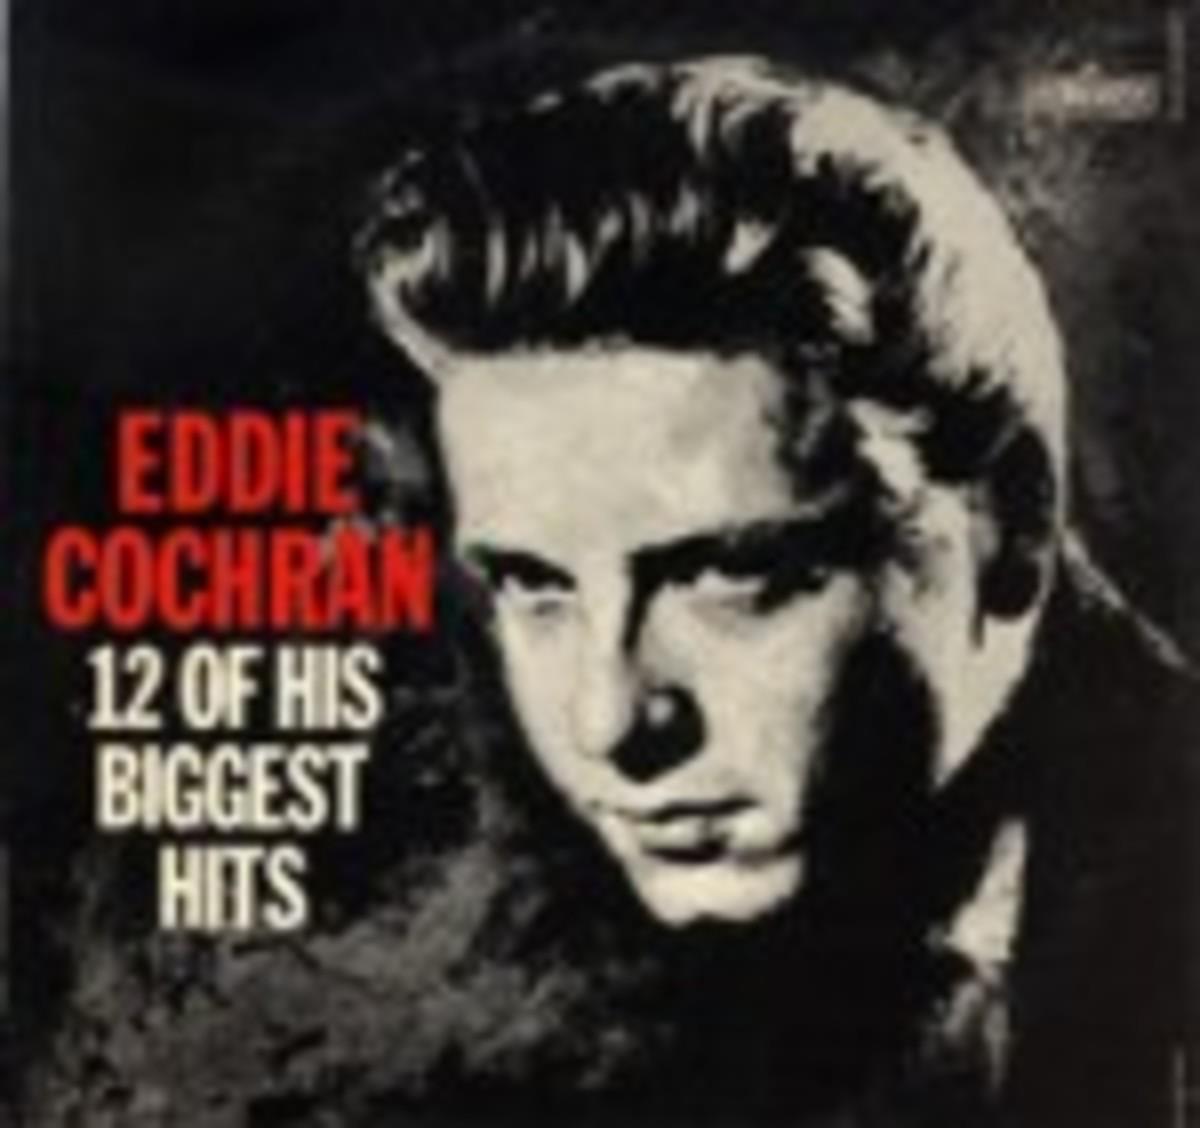 EddieCochrane_Hits_MemorialAlbum